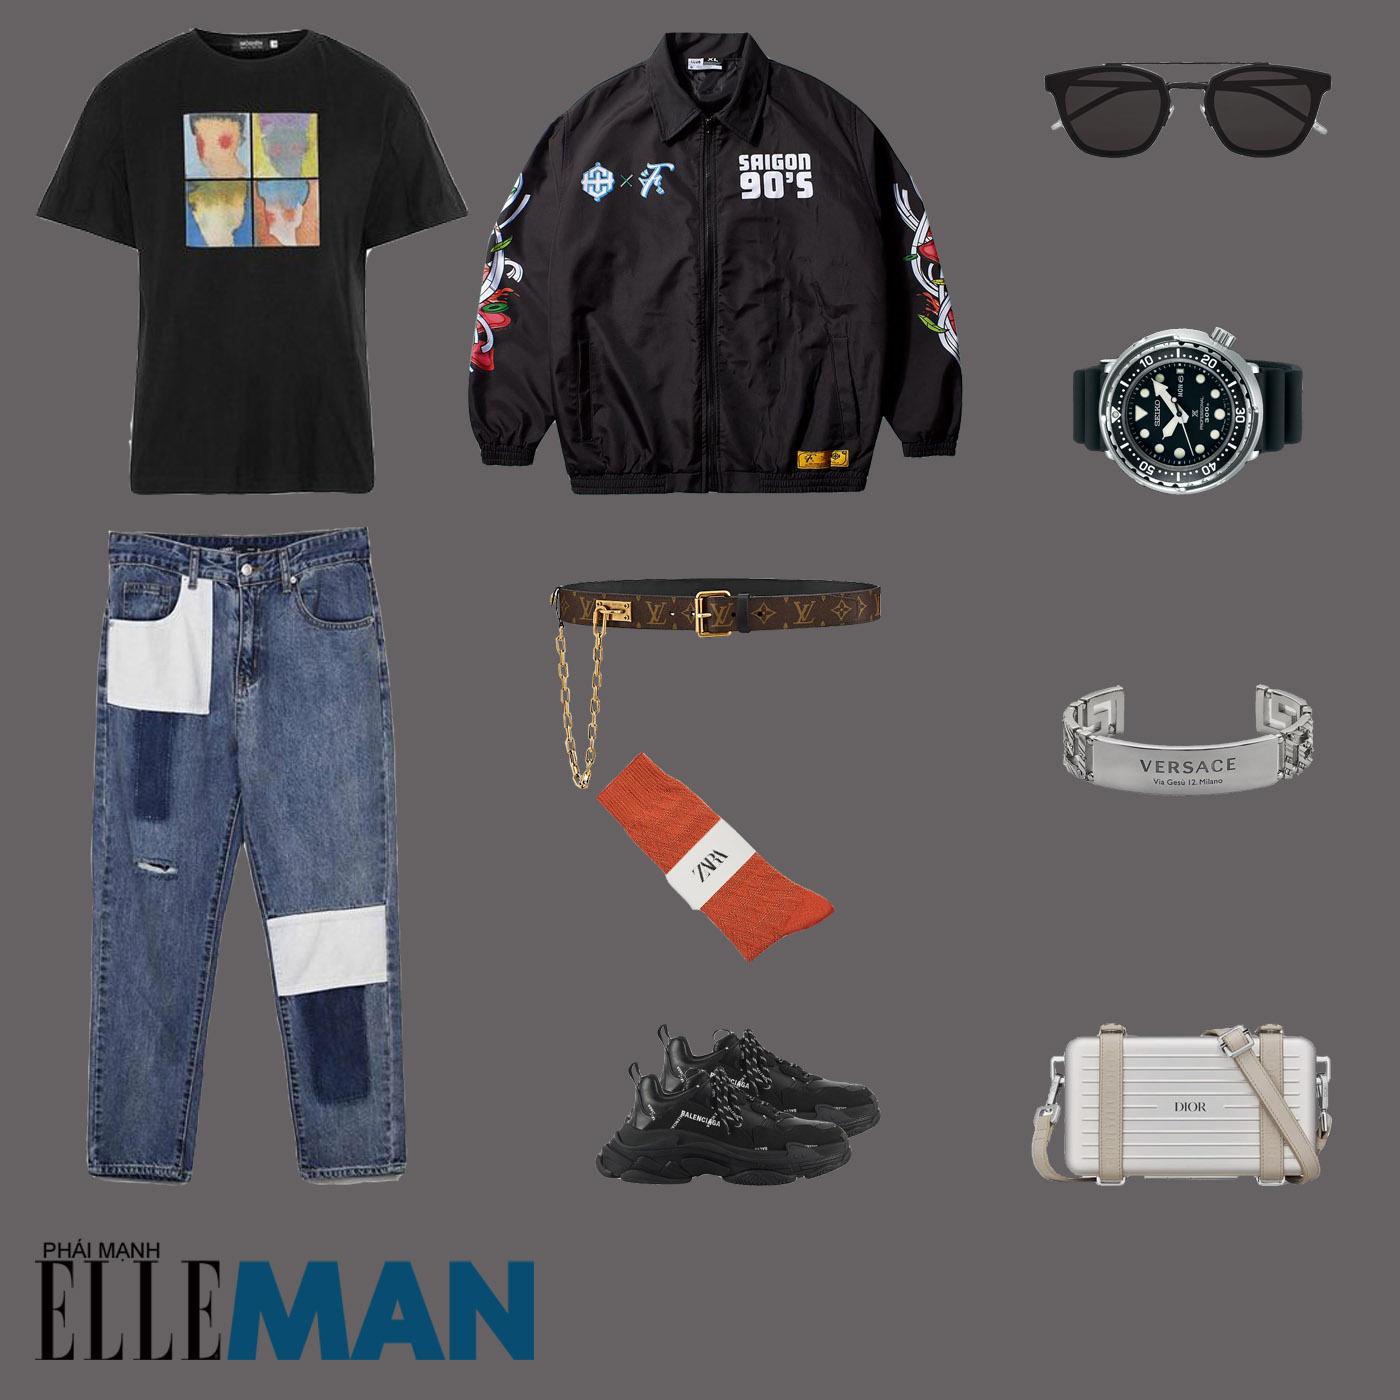 outfit 3 - phối đồ với quần dad jeans